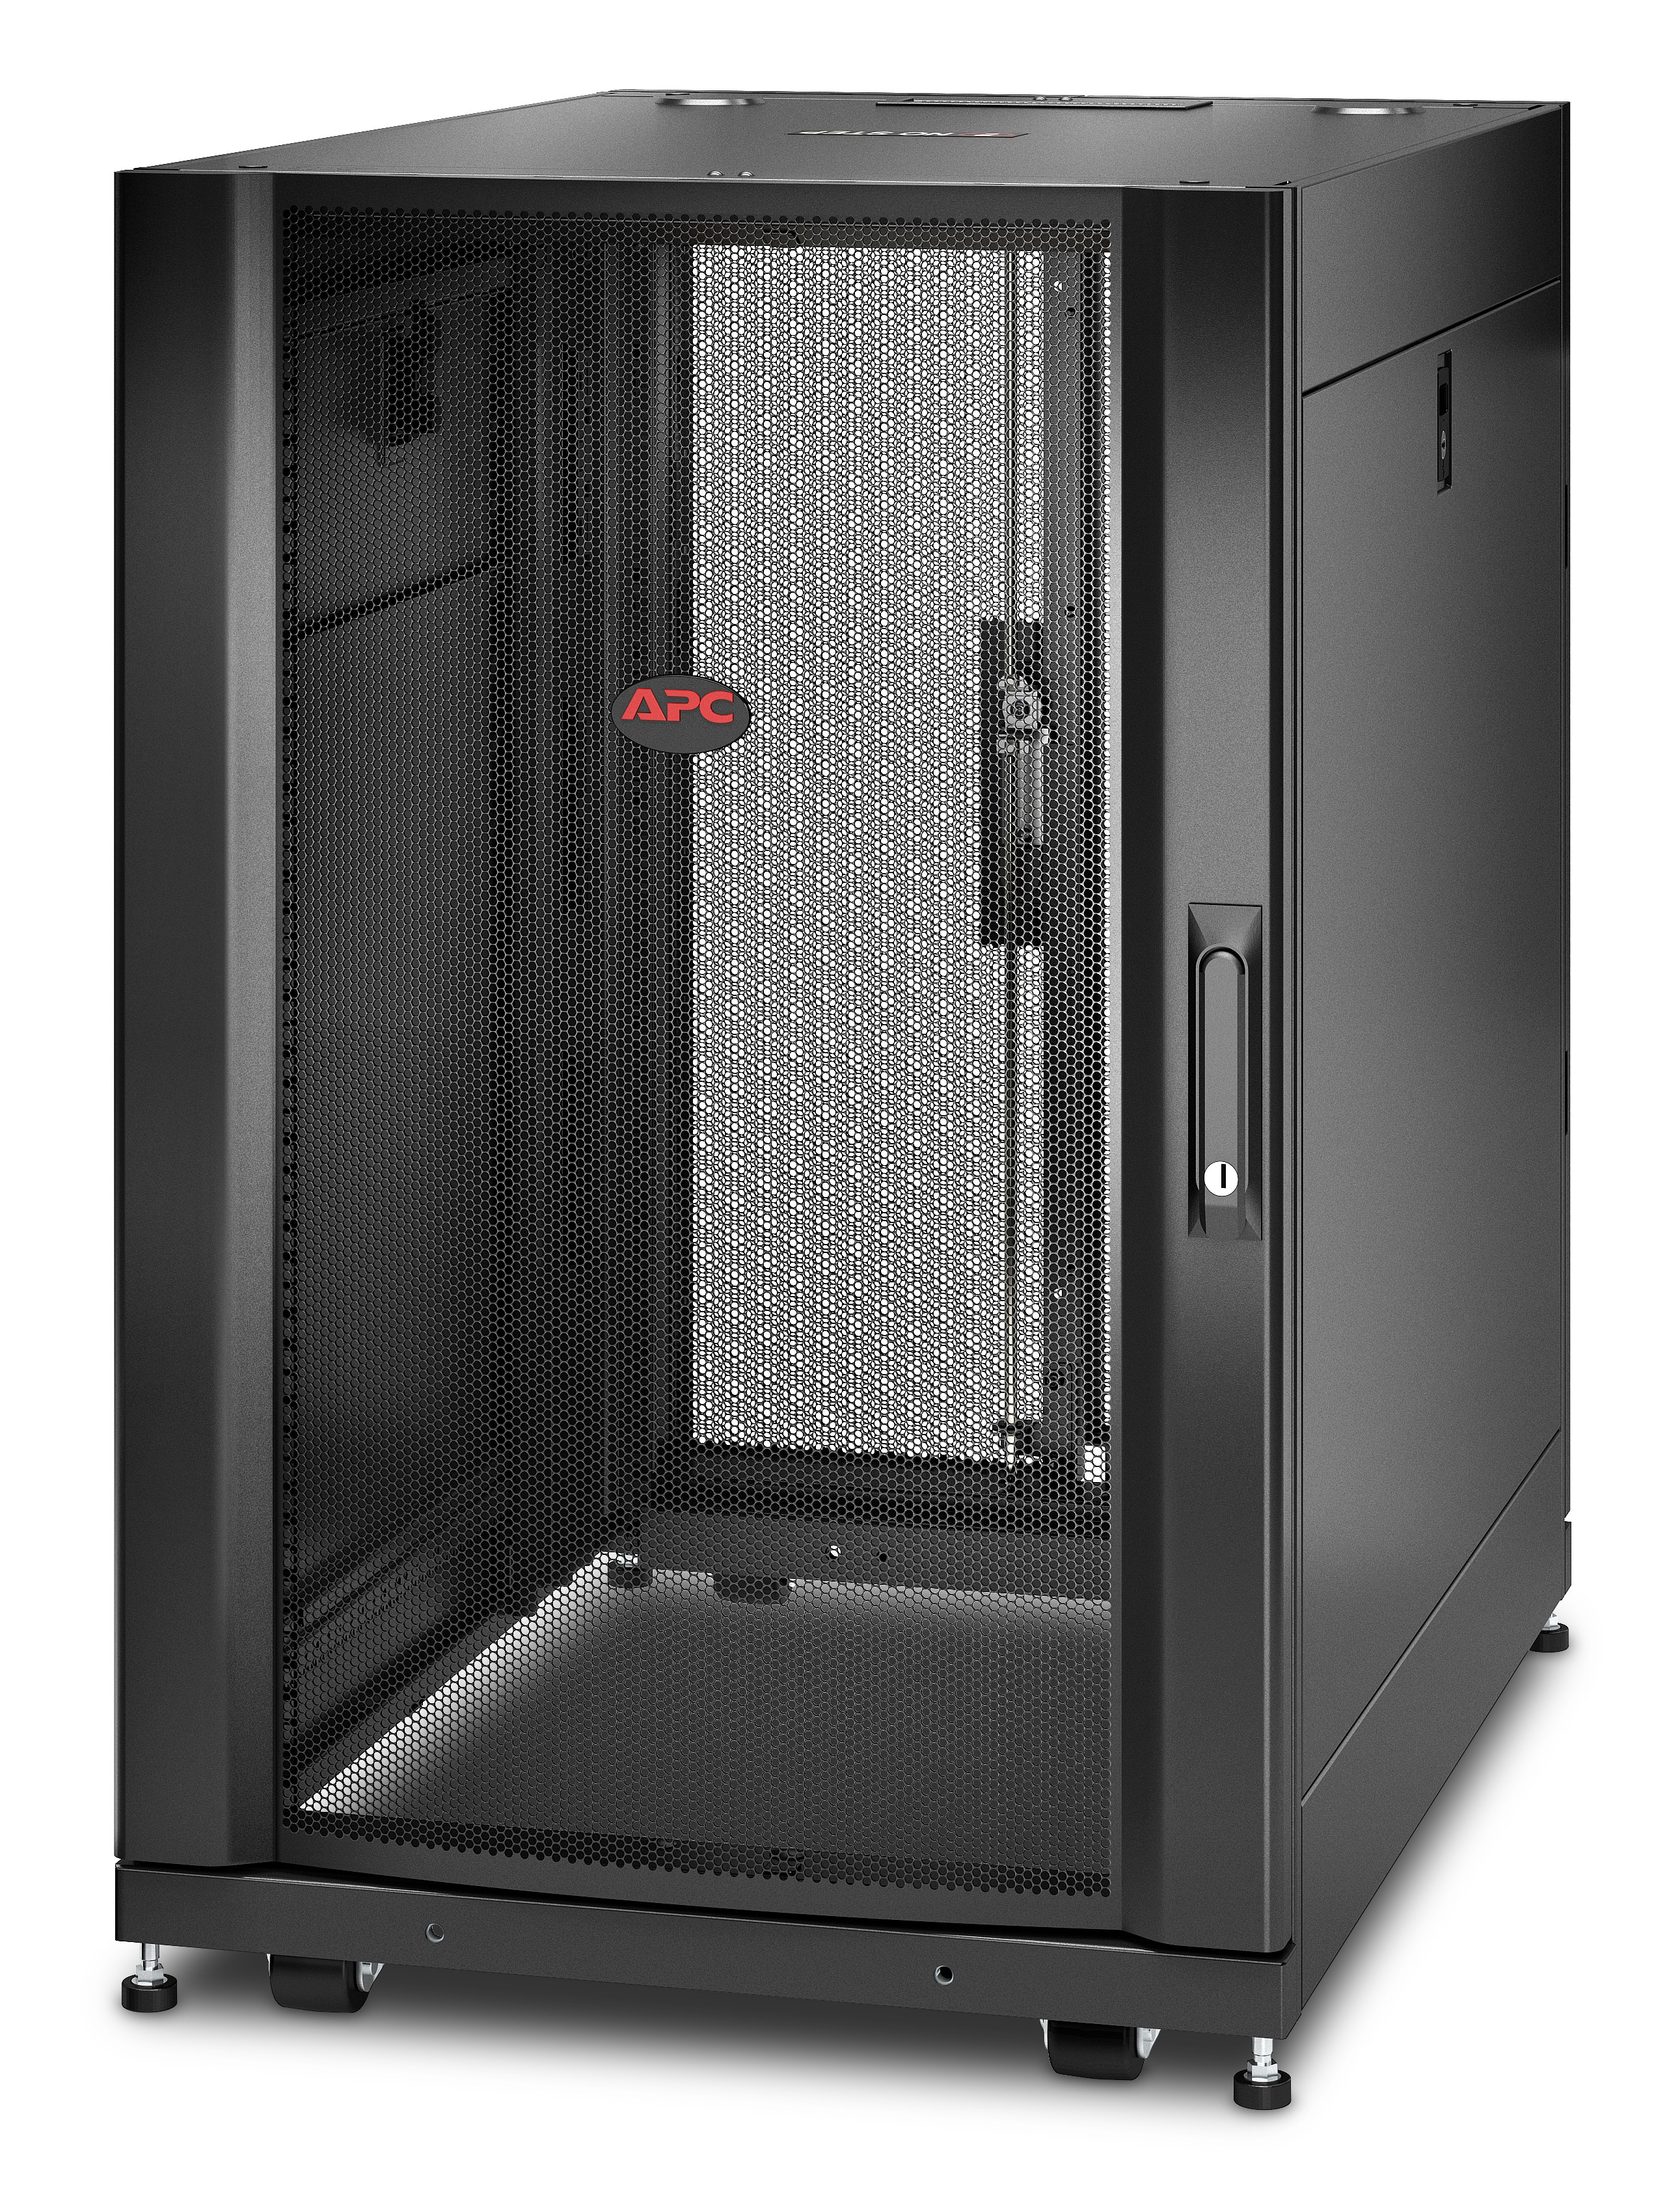 APC NetShelter SX - 18U - Freistehendes Gestell - 409 kg - Schwarz - IP20 - UL 2416 - UL 60950-1 - REACH